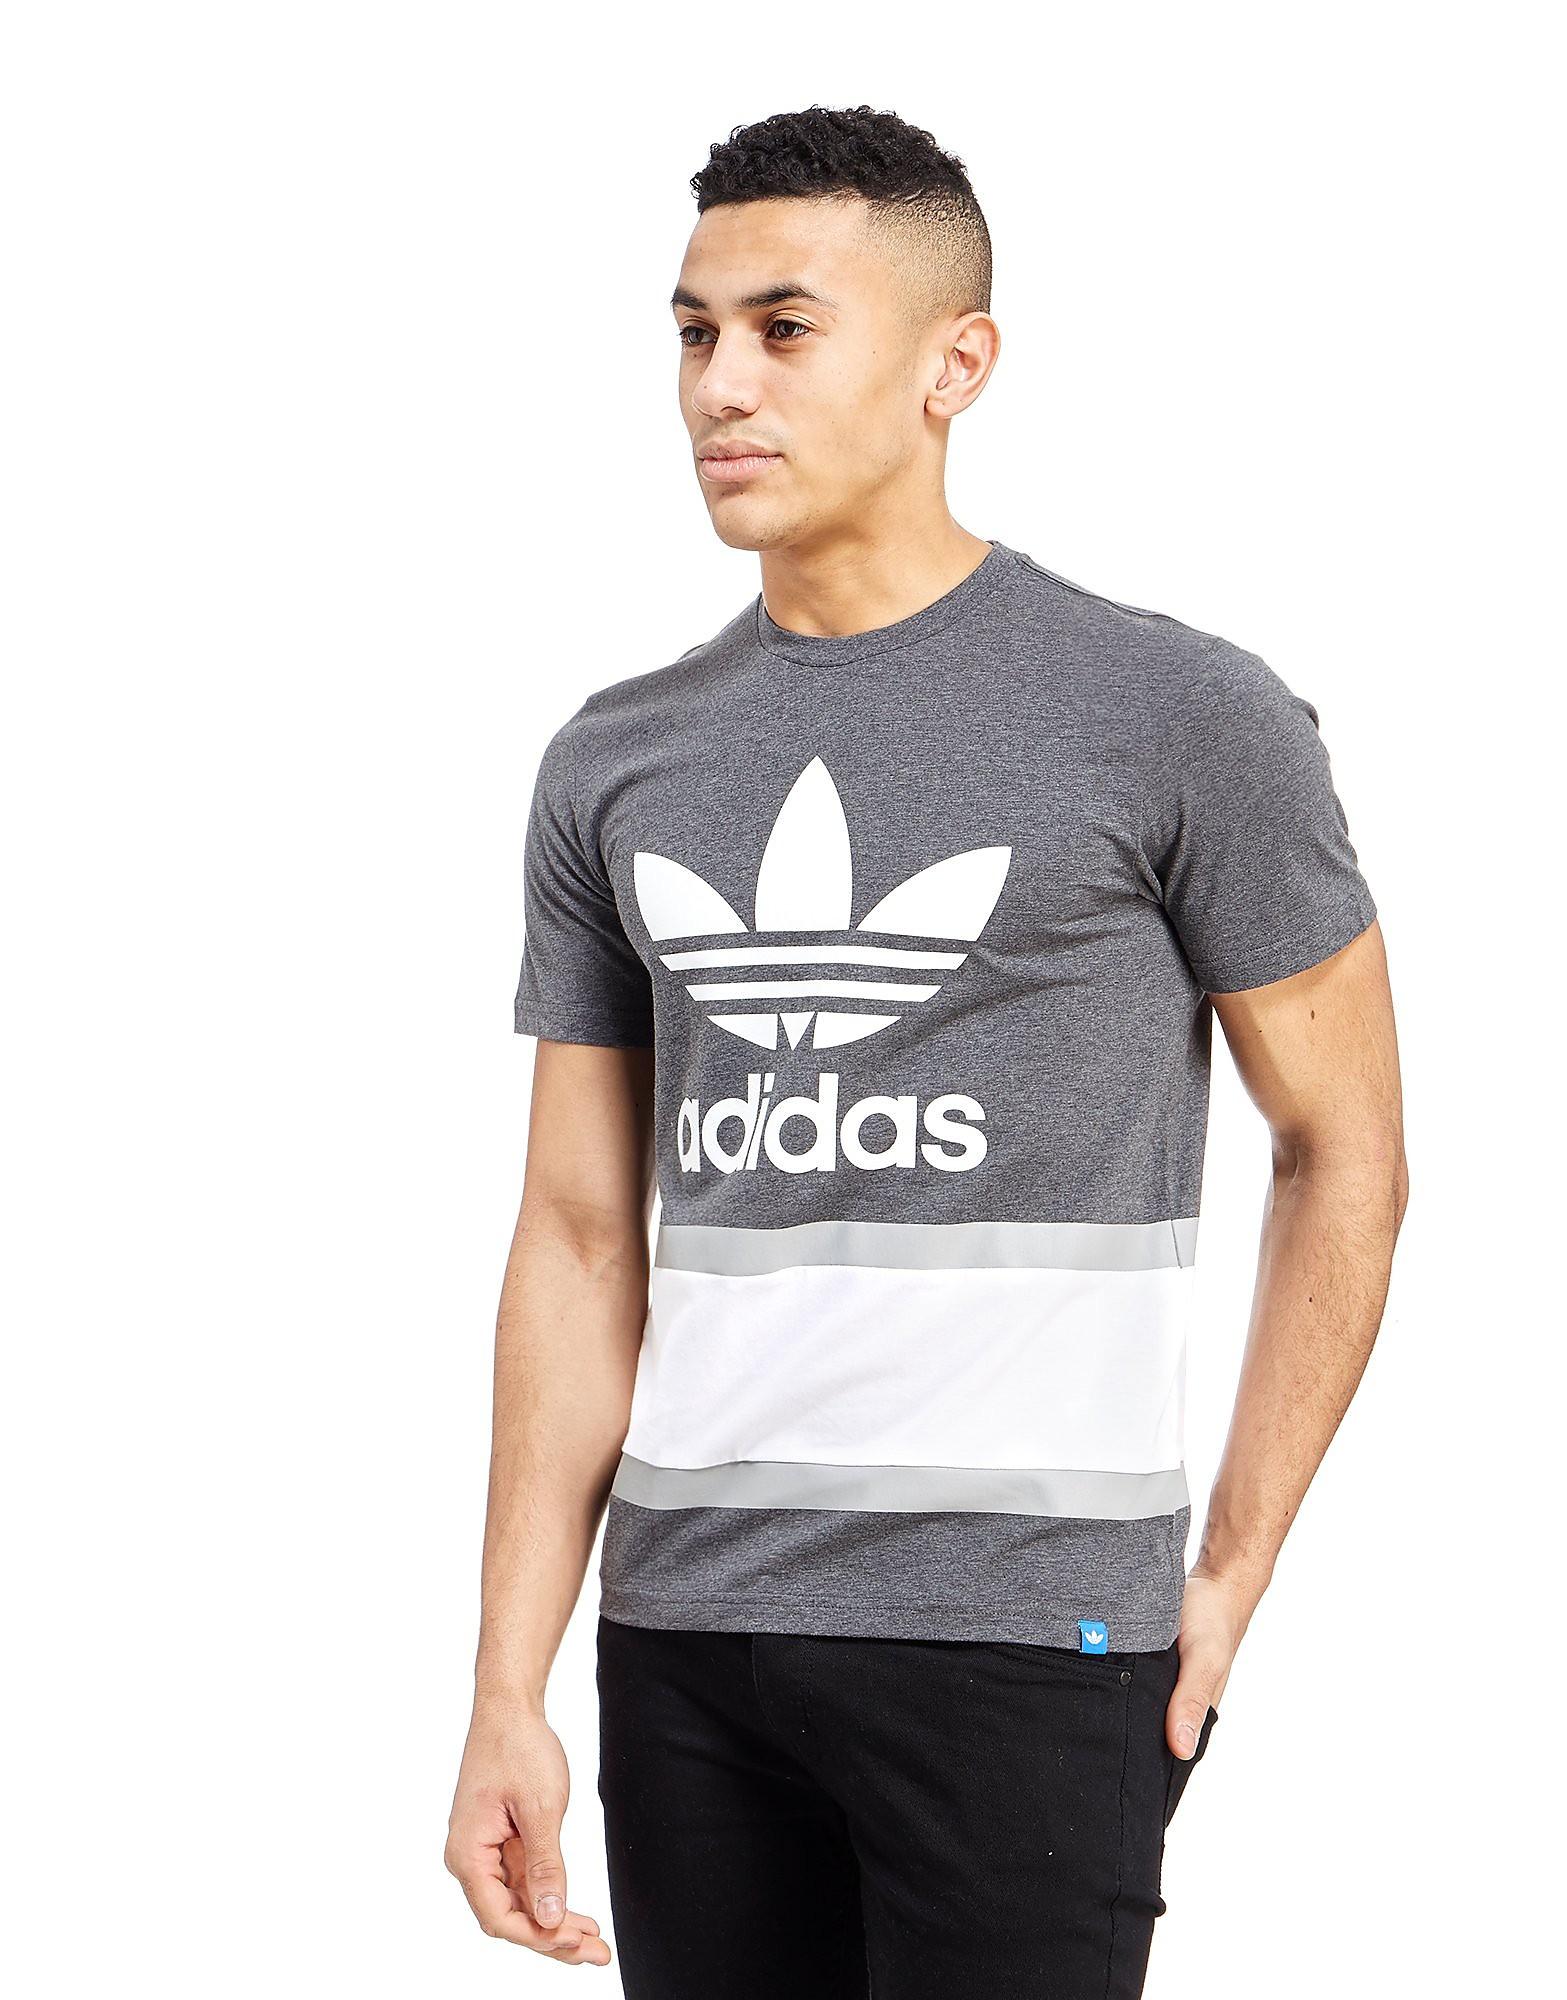 adidas Originals Trefoil Panel T-Shirt